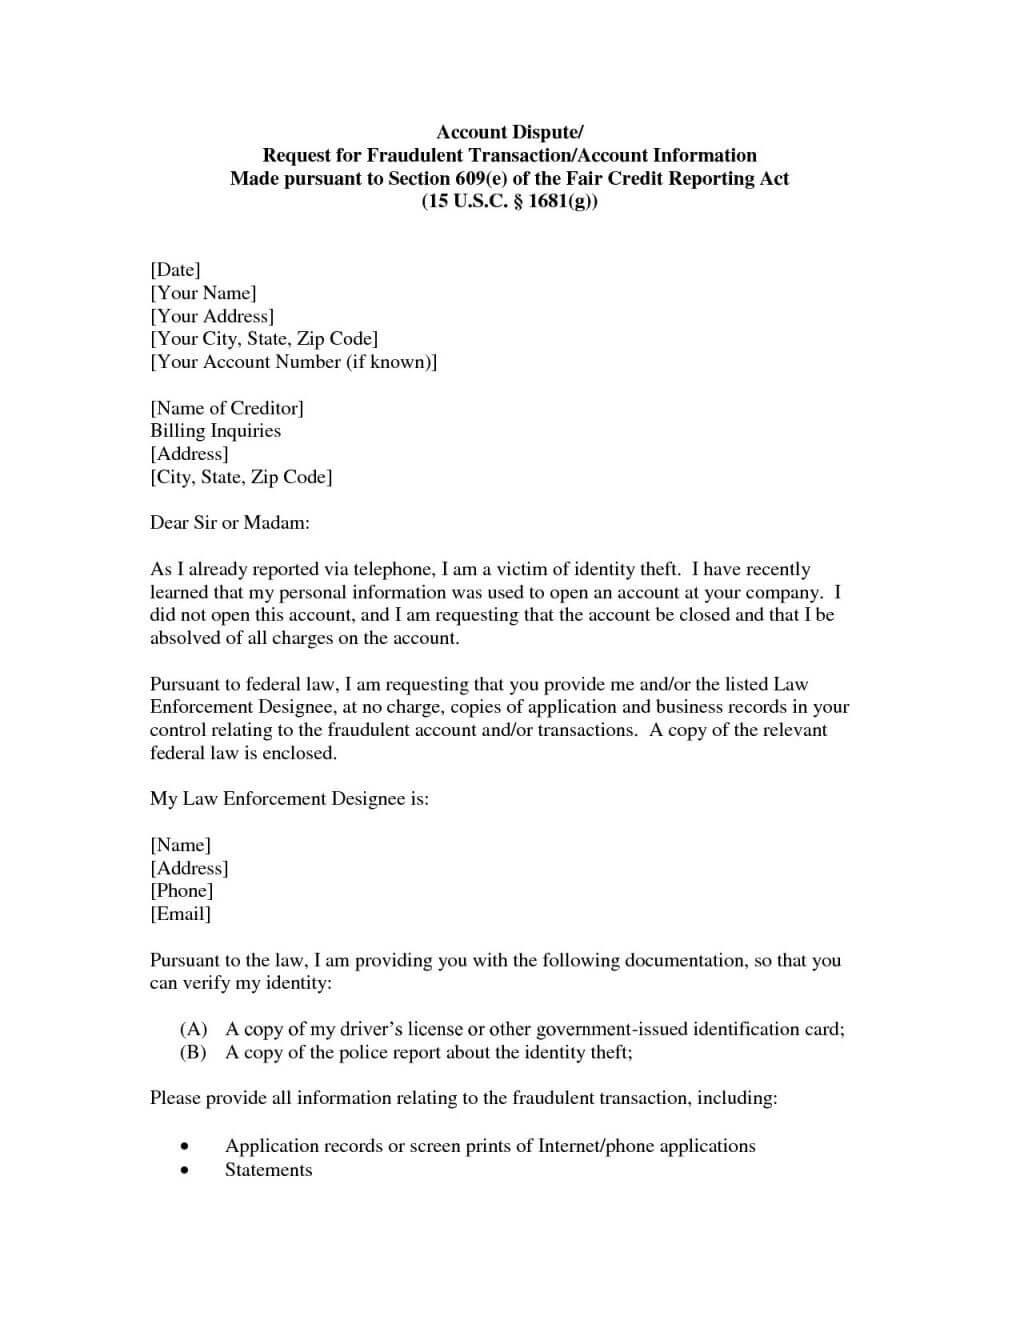 Credit Repair Letter Section 609 Dispute Sample Throughout 609 Dispute Letter Template